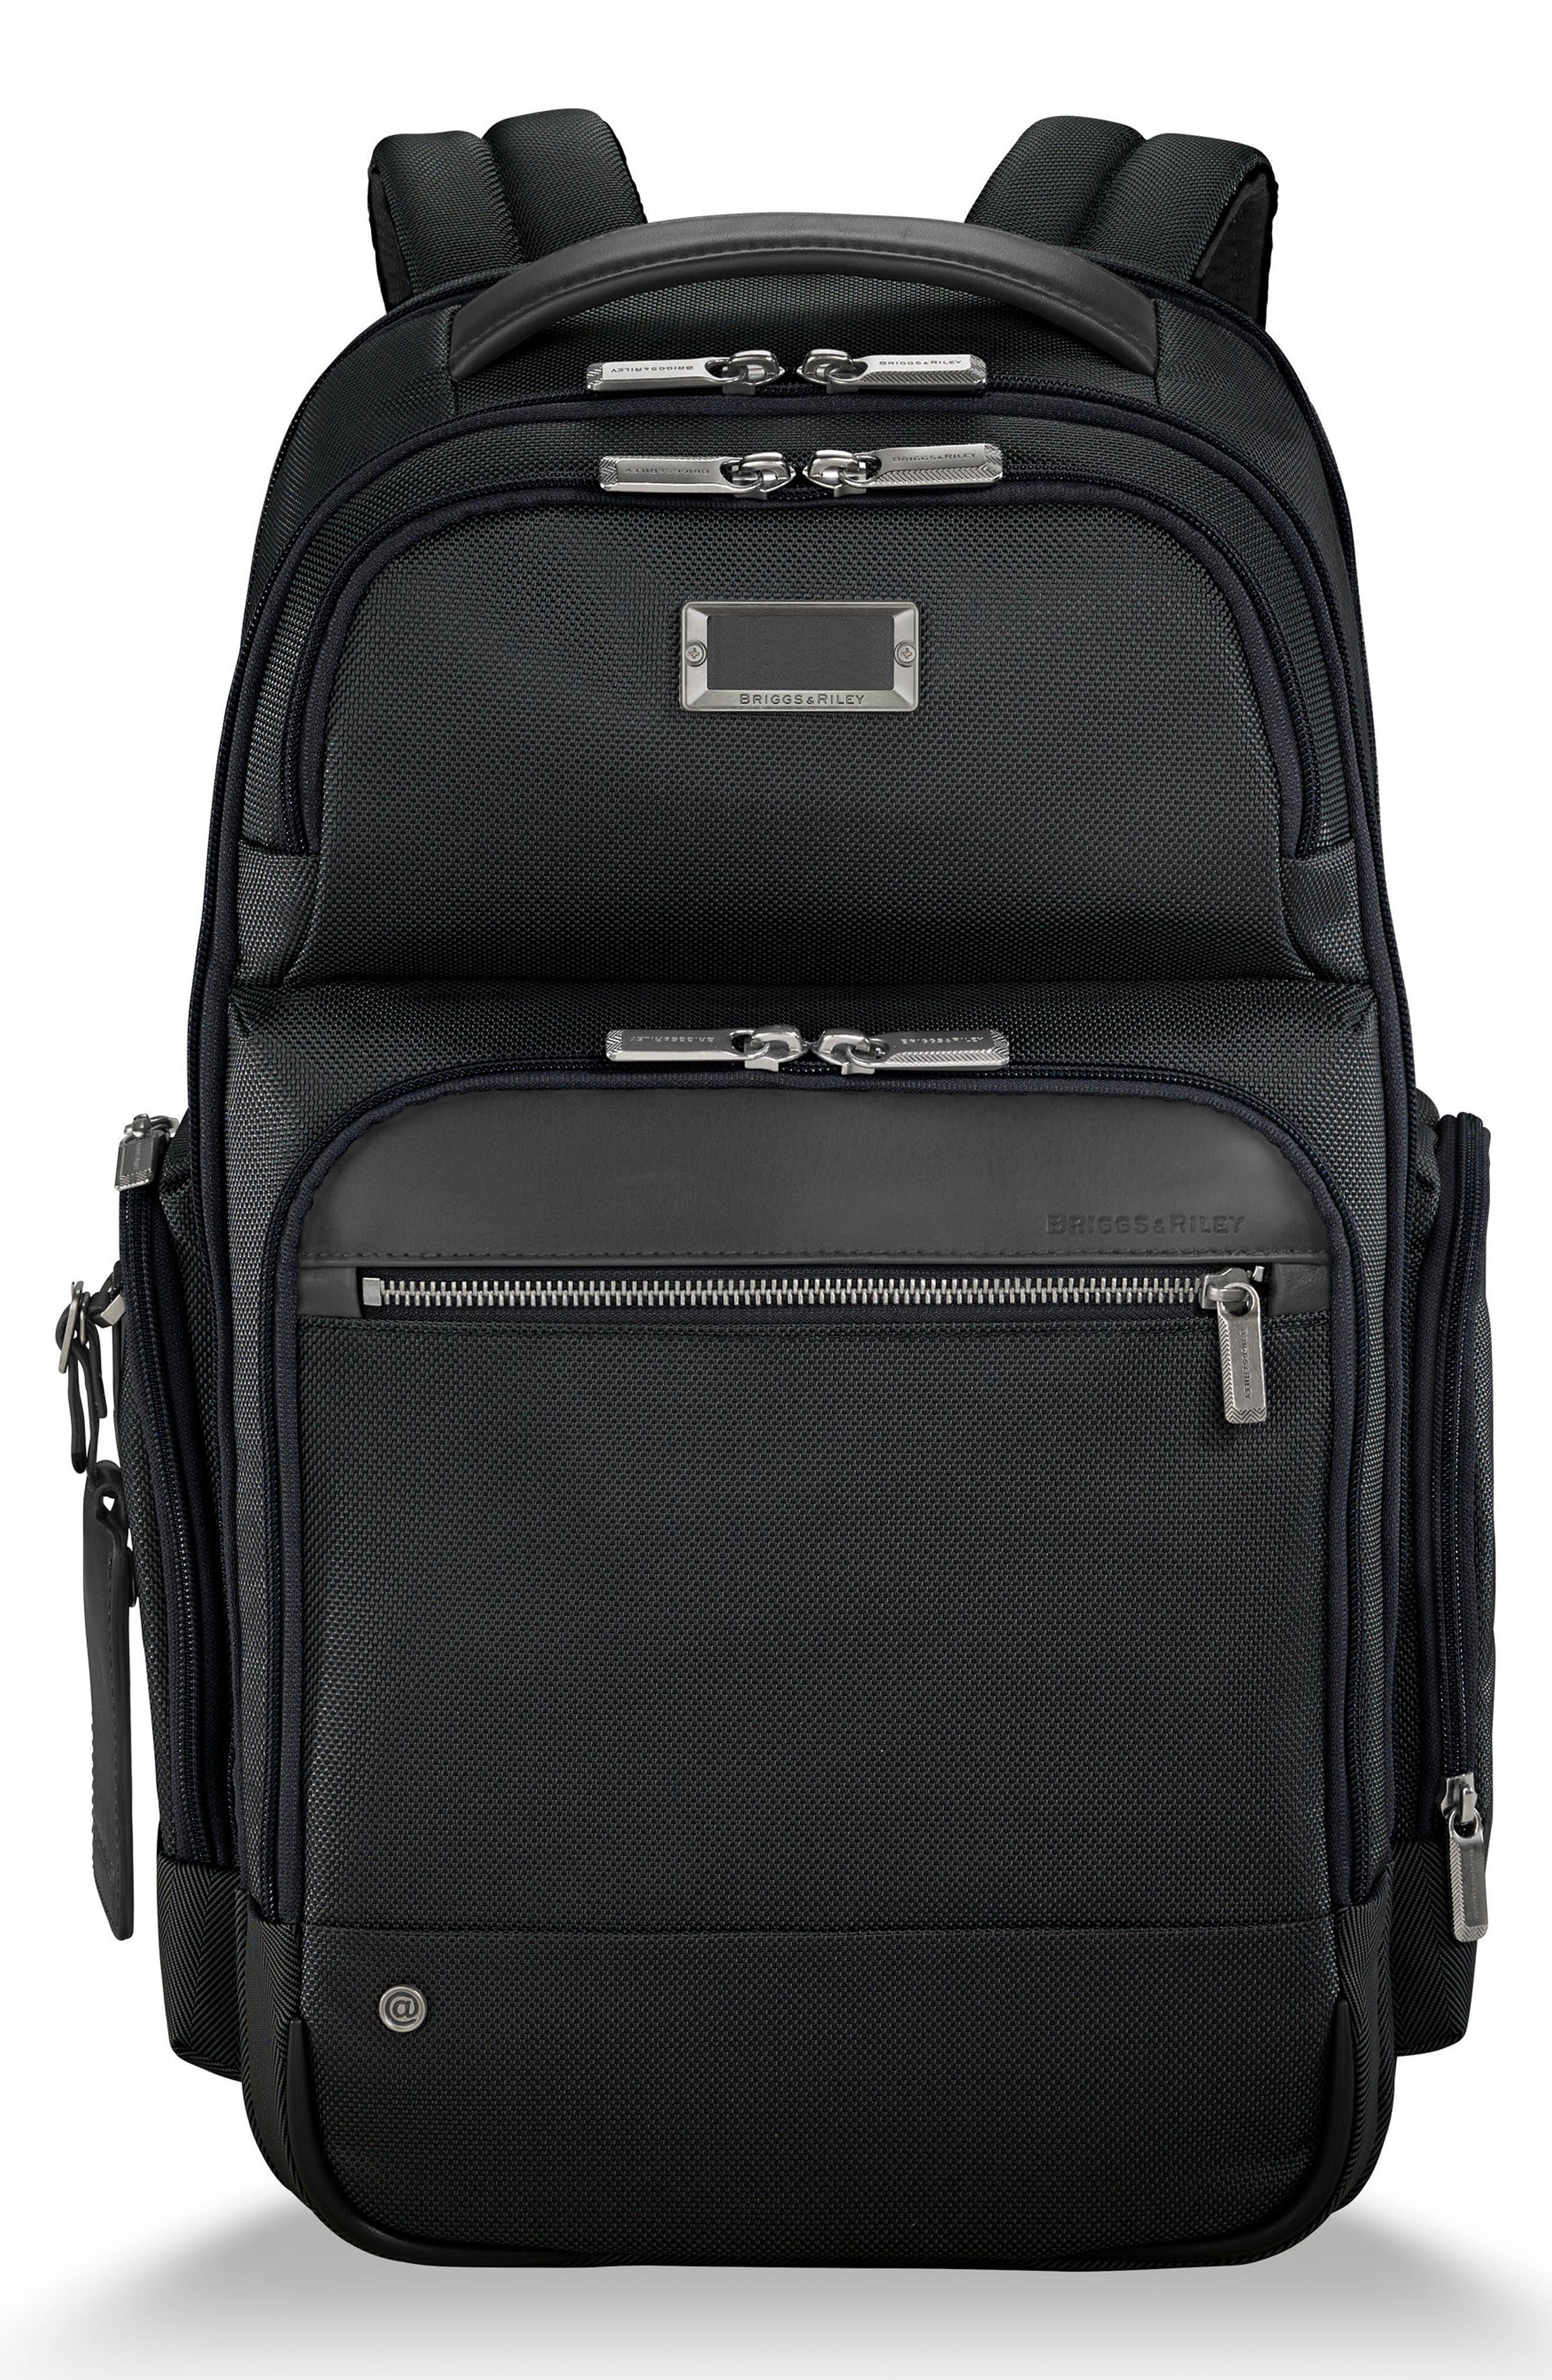 @Work Medium Cargo Backpack by Briggs & Riley